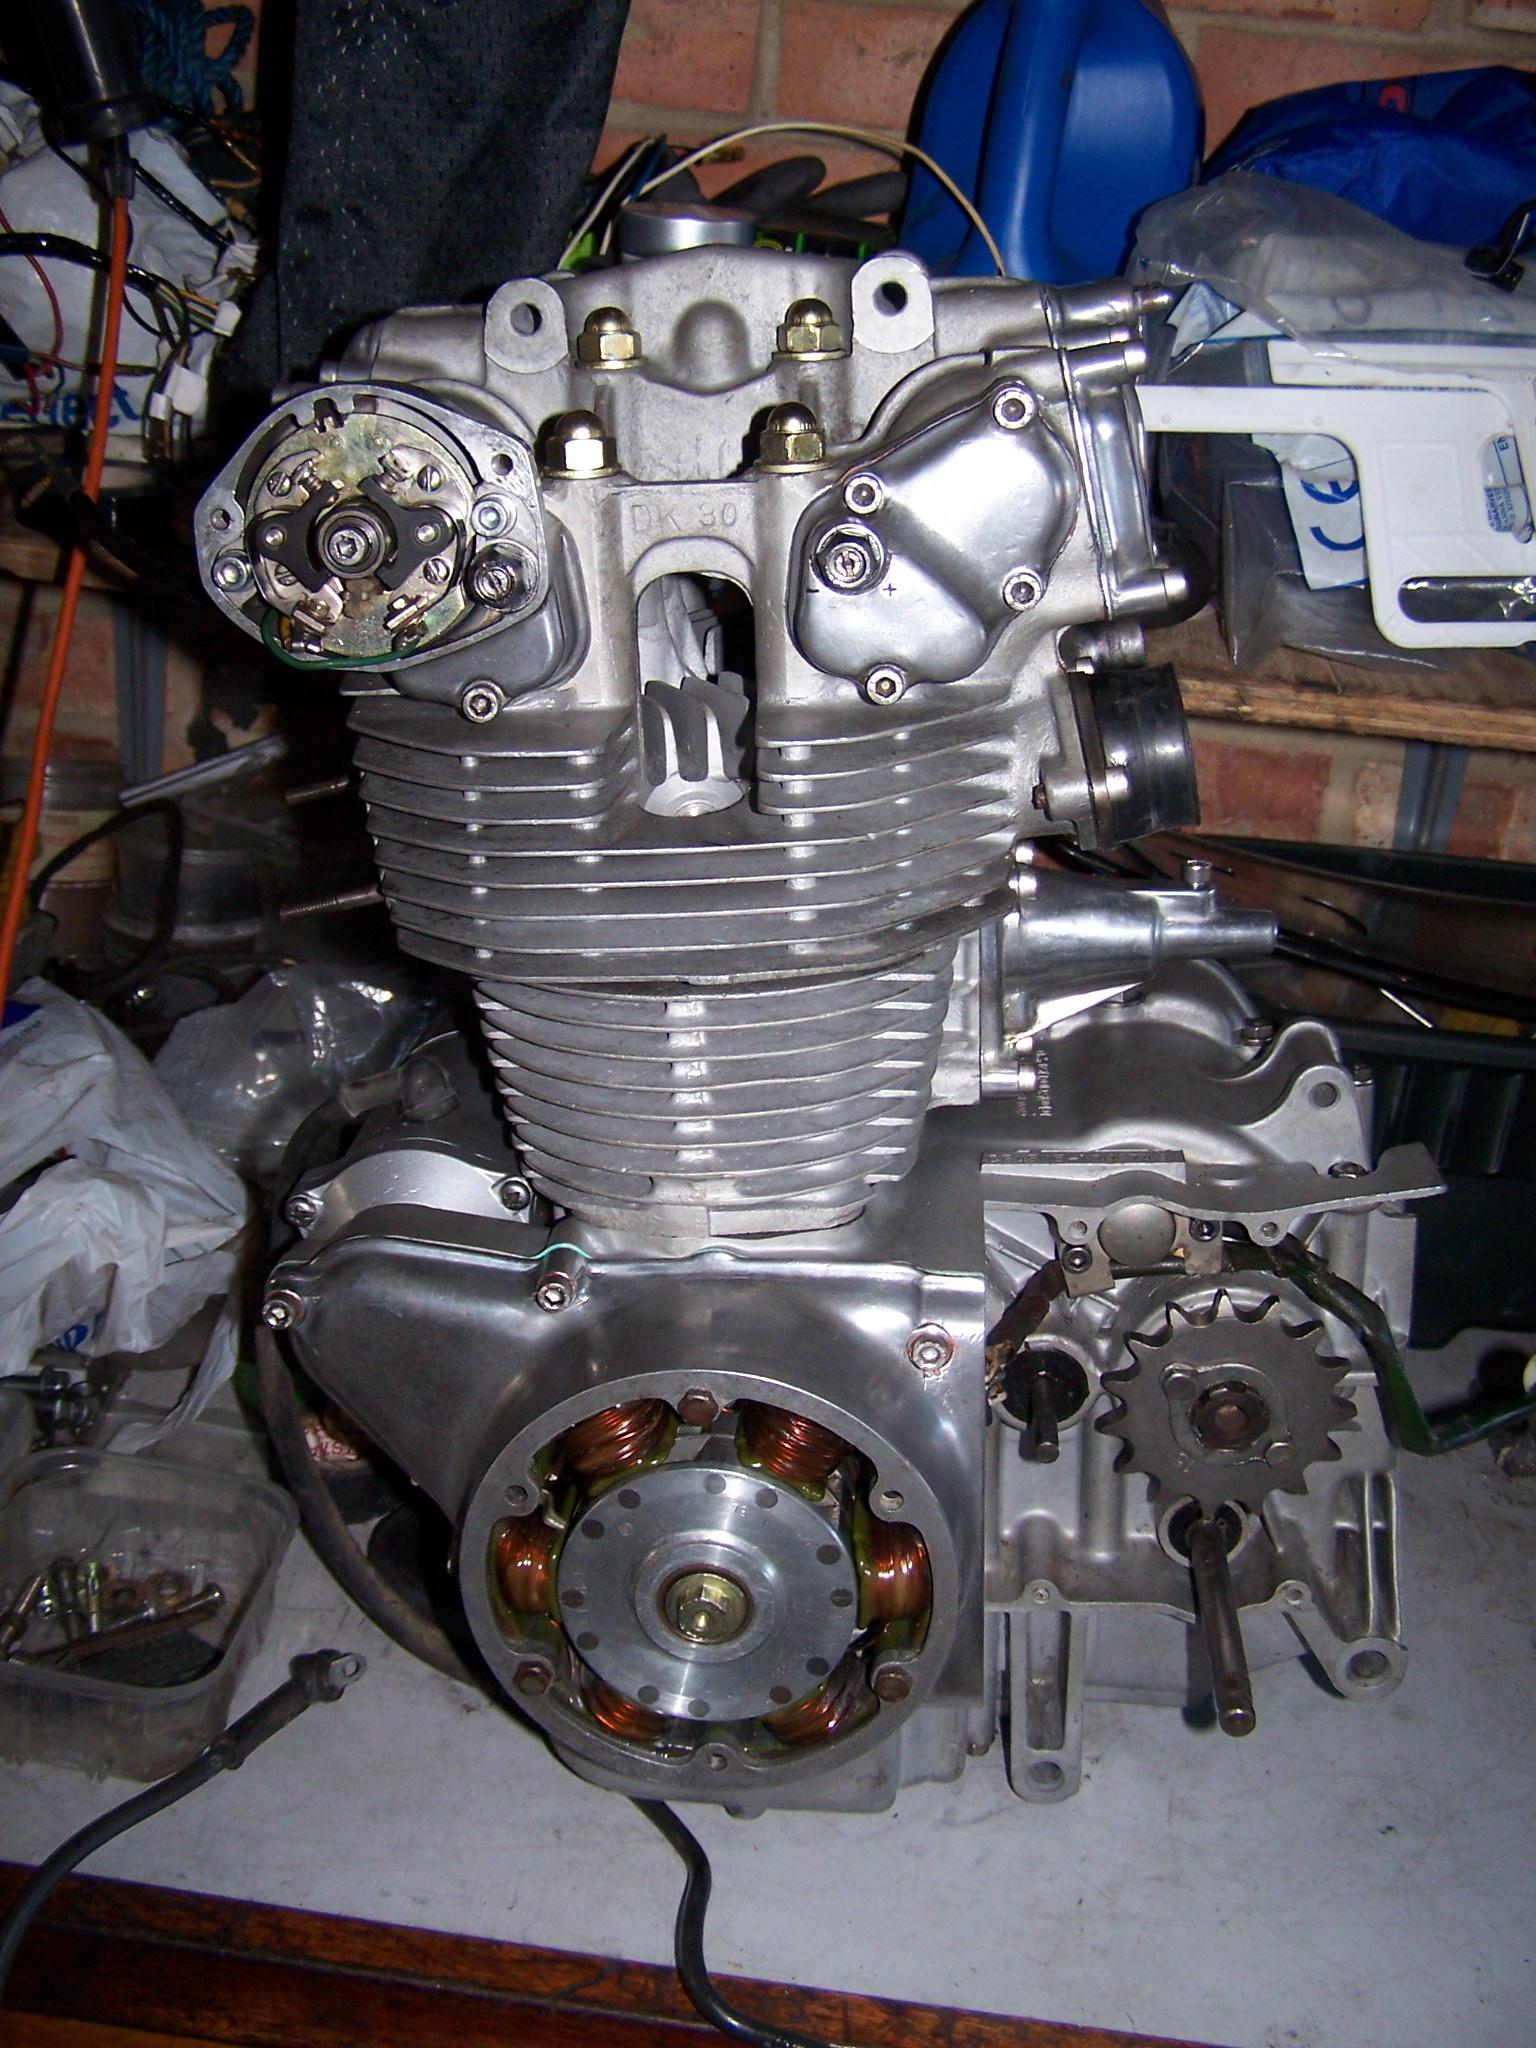 Honda Cb Cafe Racer >> 1975 Honda CB500T Cafe Racer - Page 2